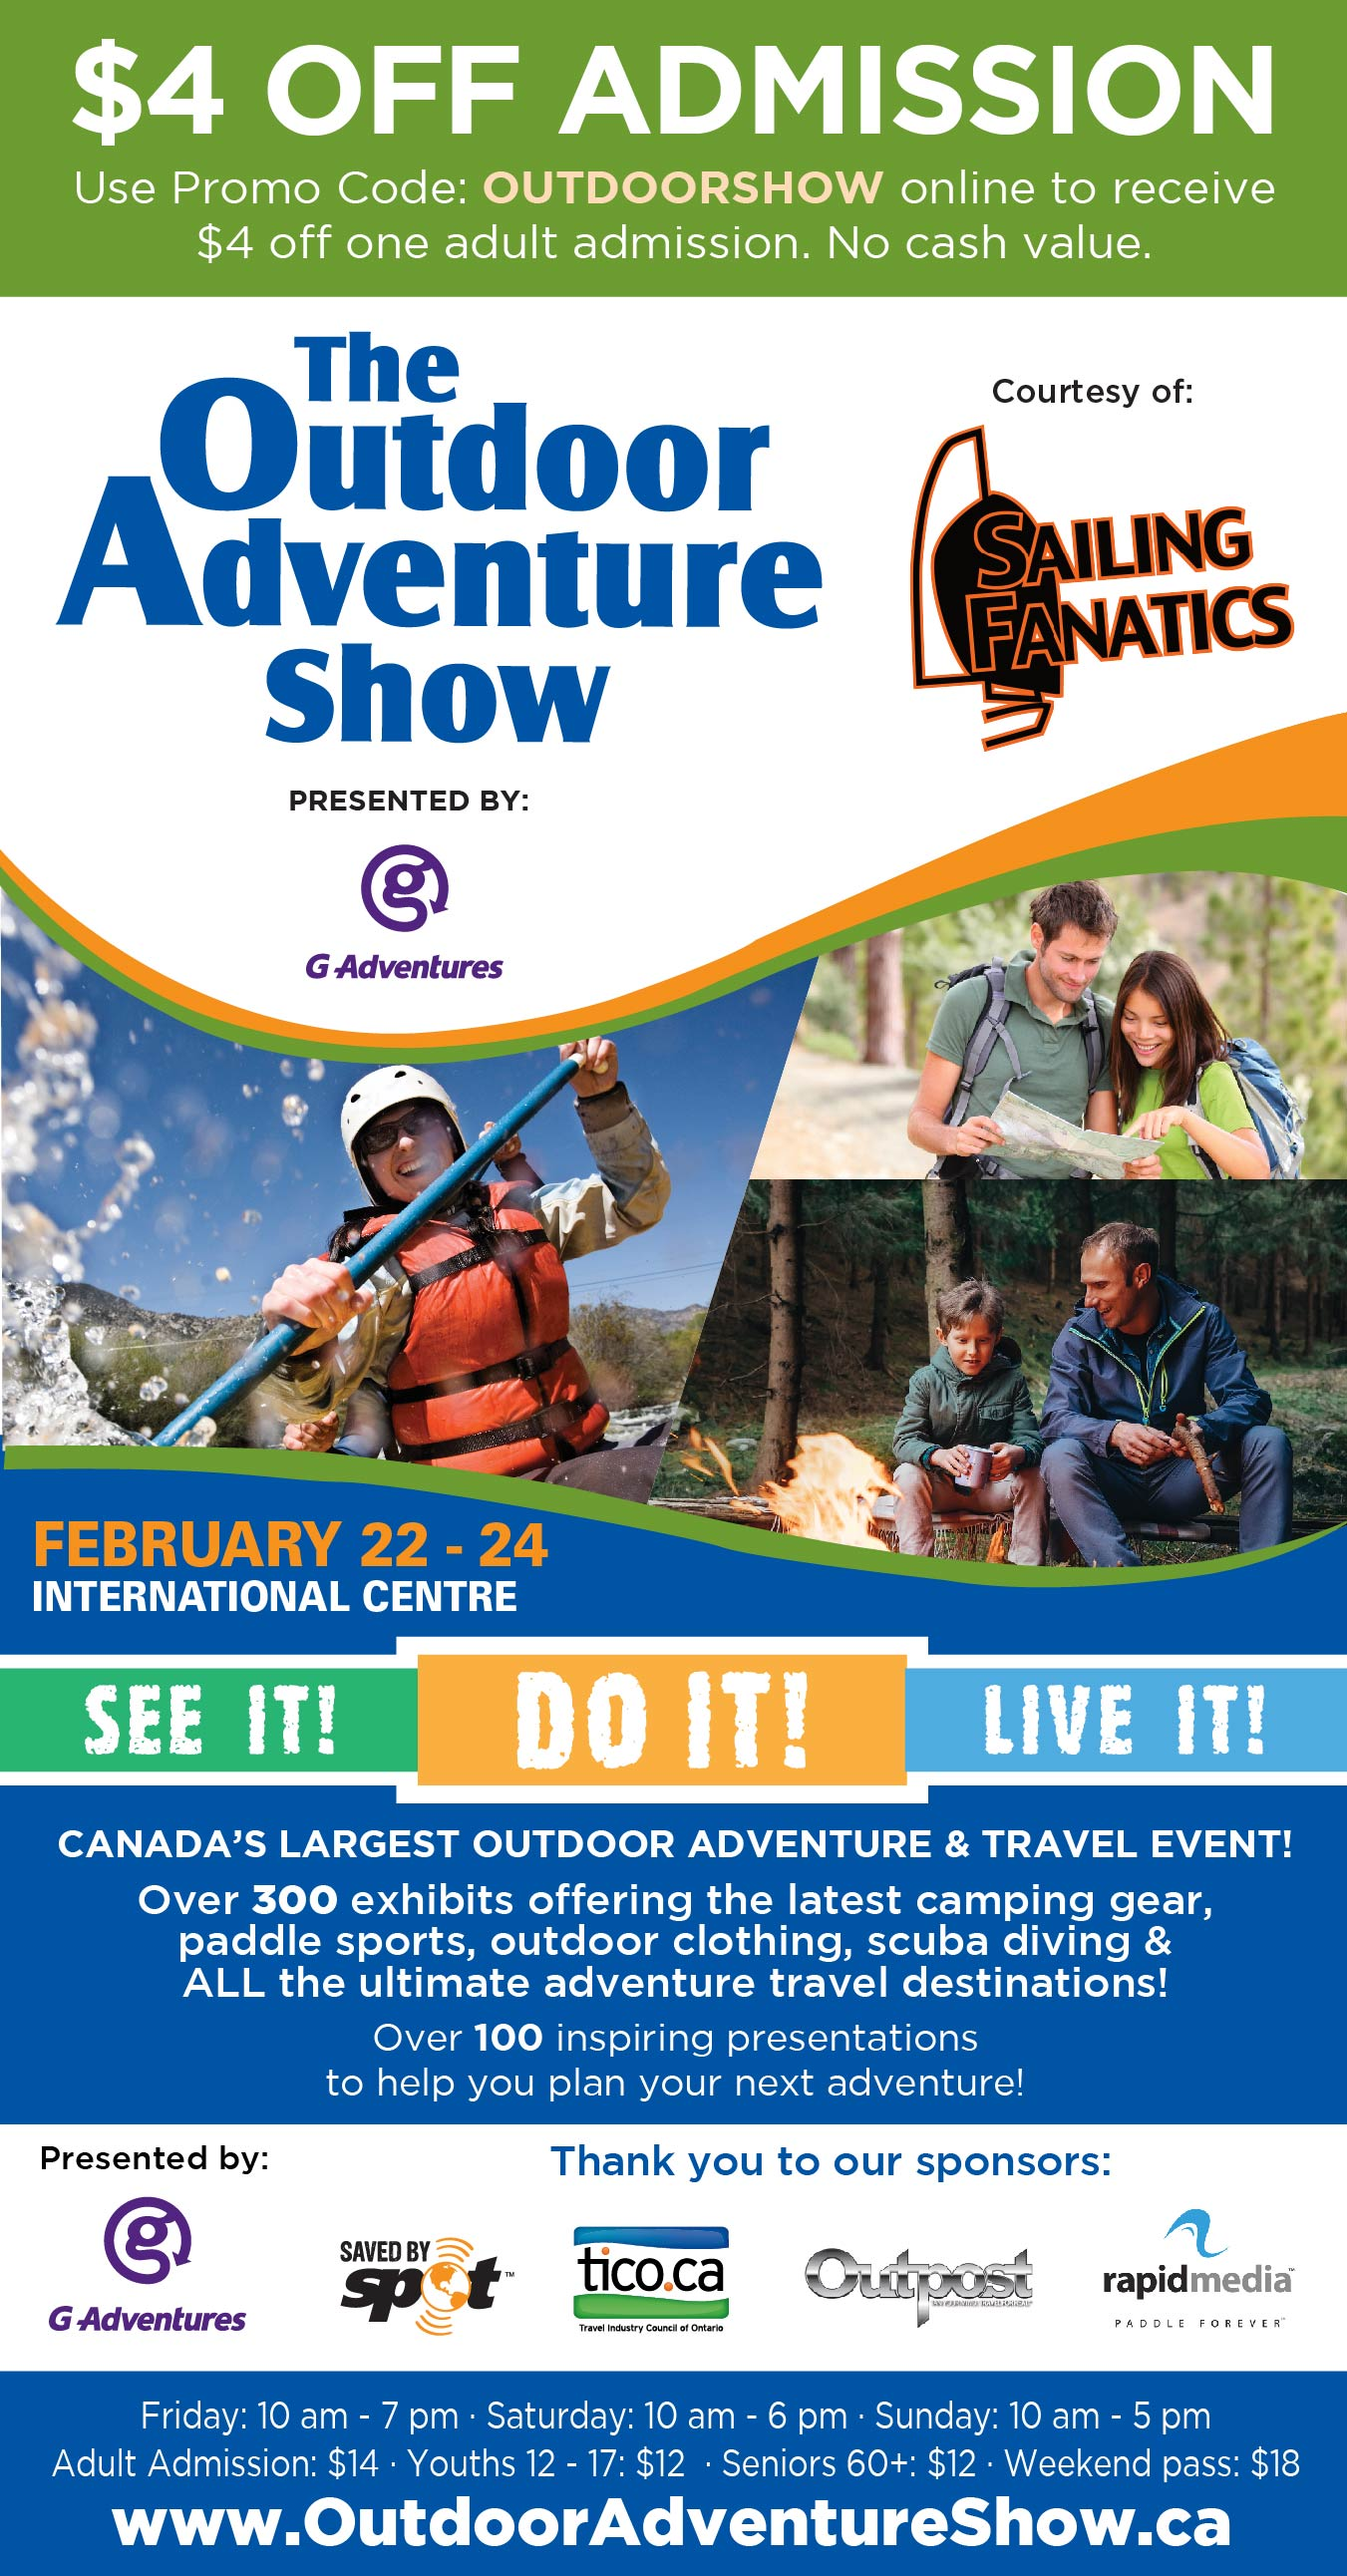 Talk to us at Sailing Fanatics at the Toronto Outdoor Adventure Show